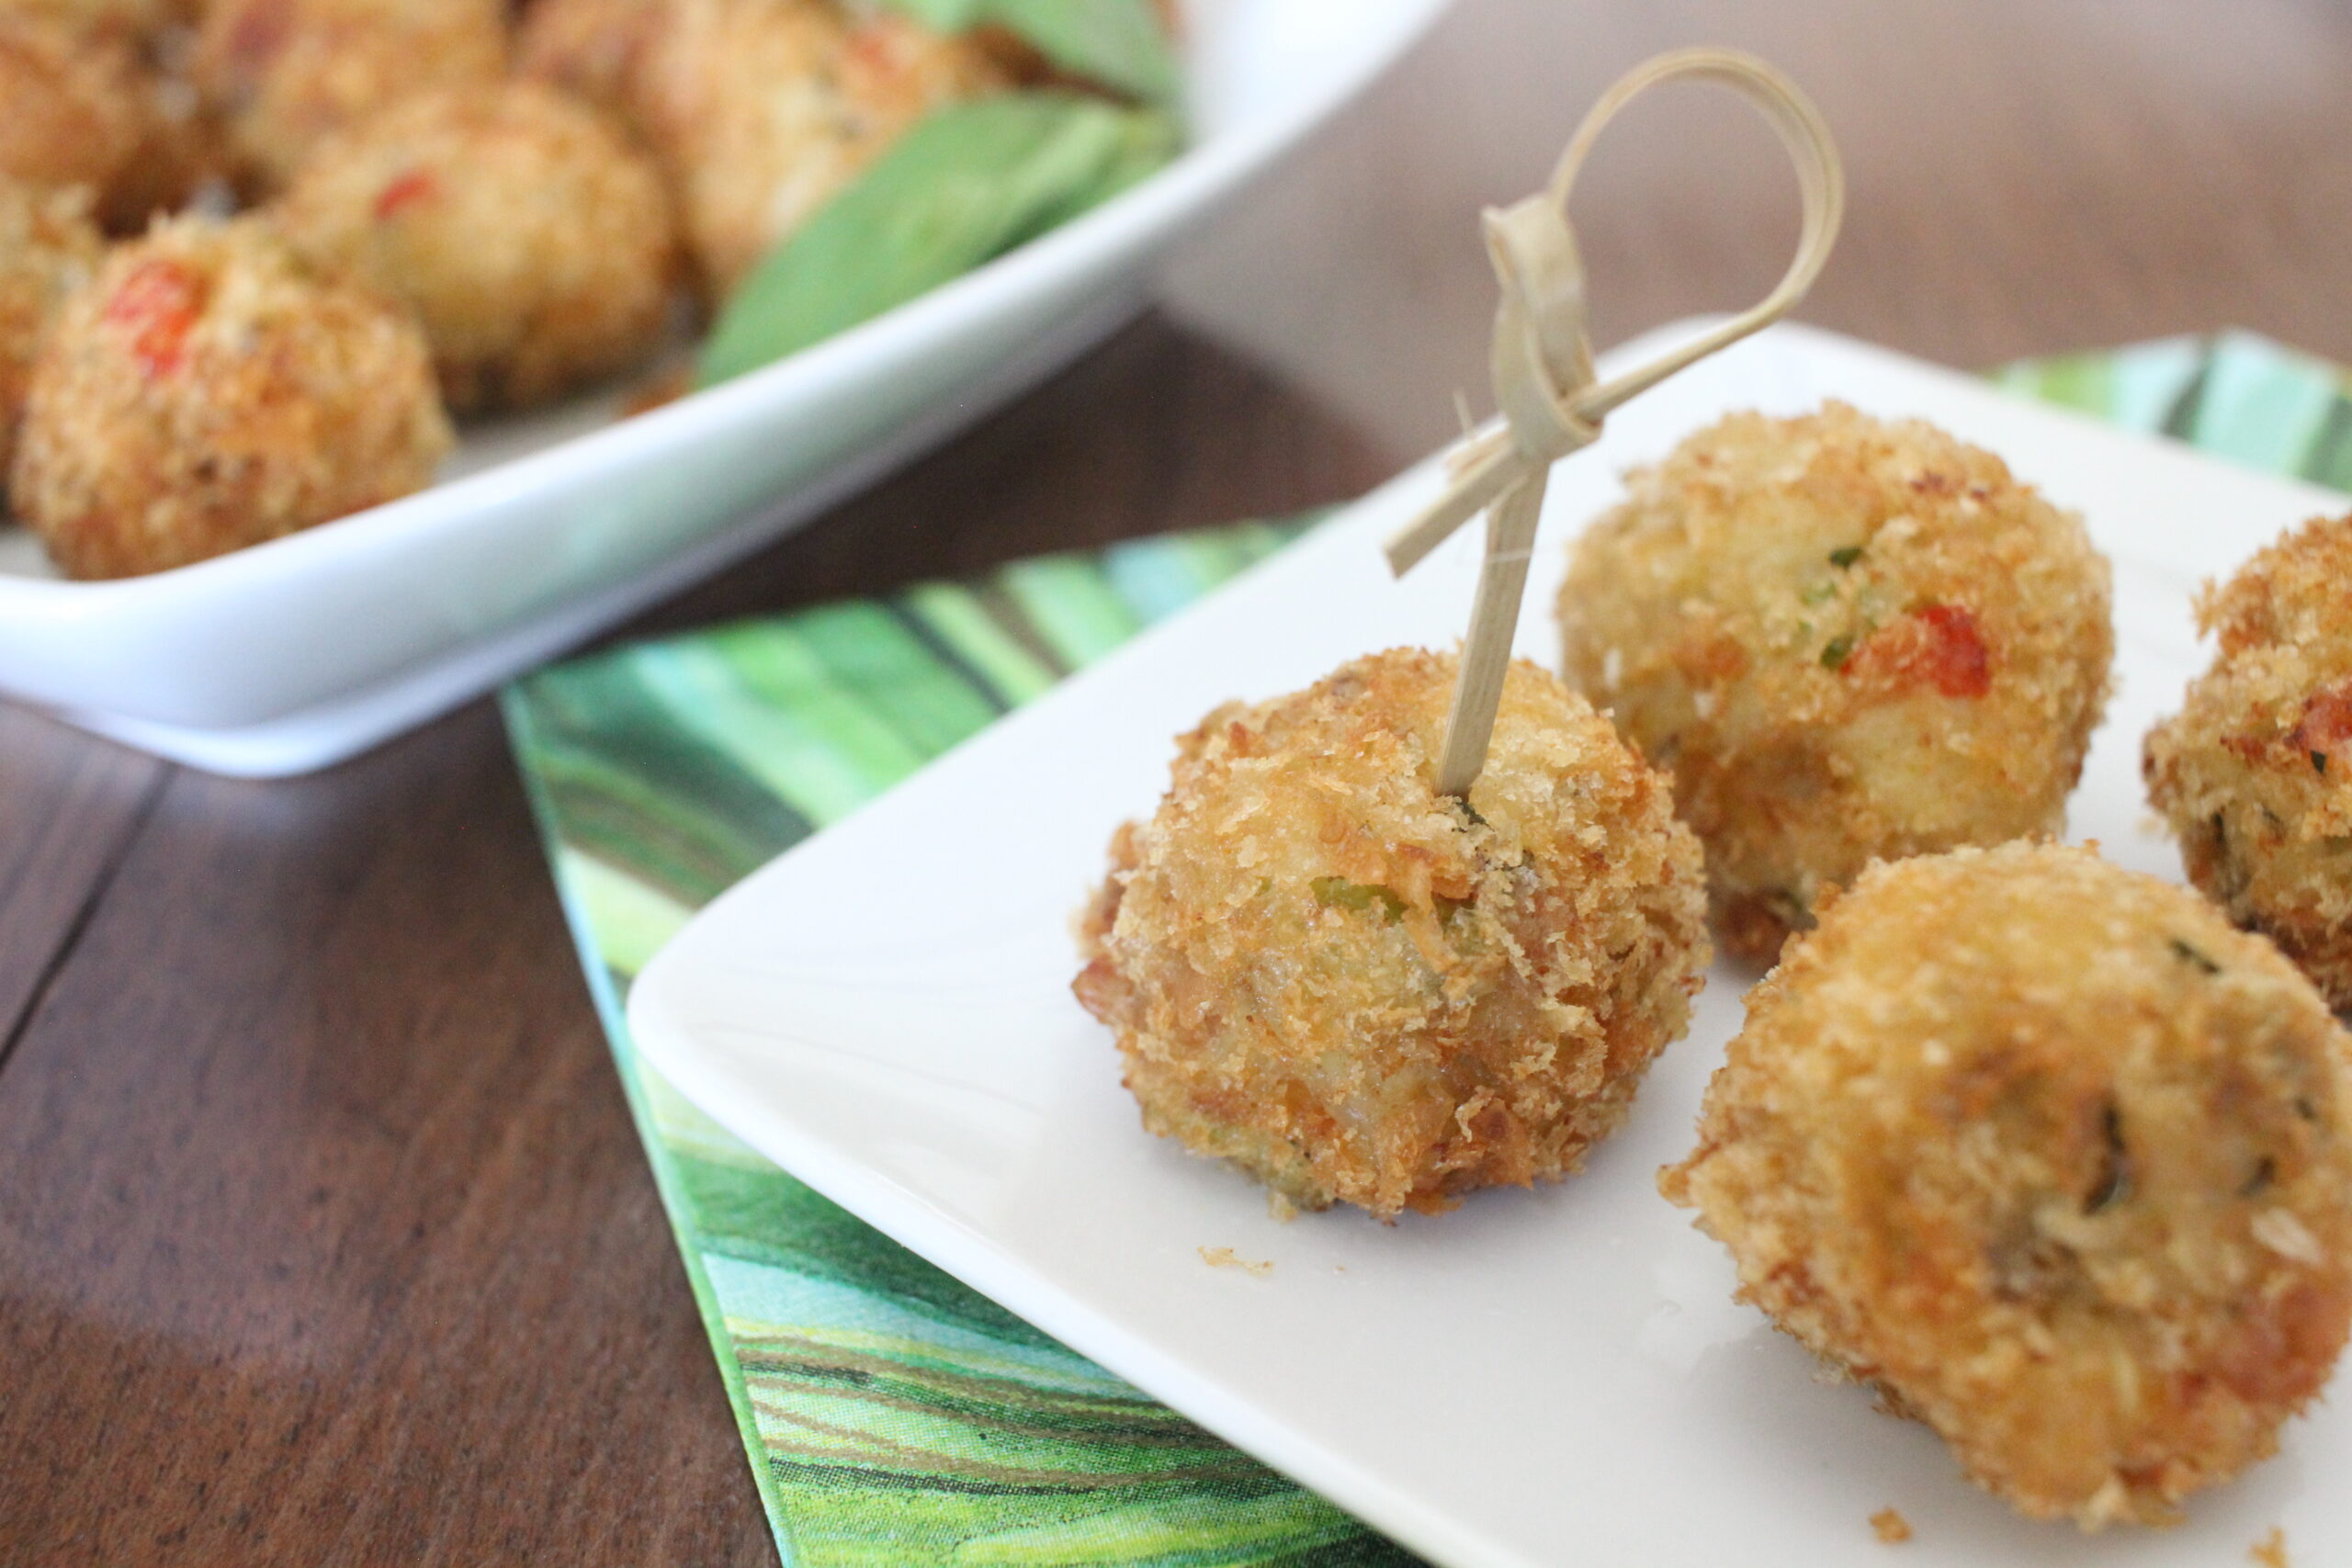 Crab Cake Appetizers with Fresh Tarragon, courtesy of Vanda Lewis.